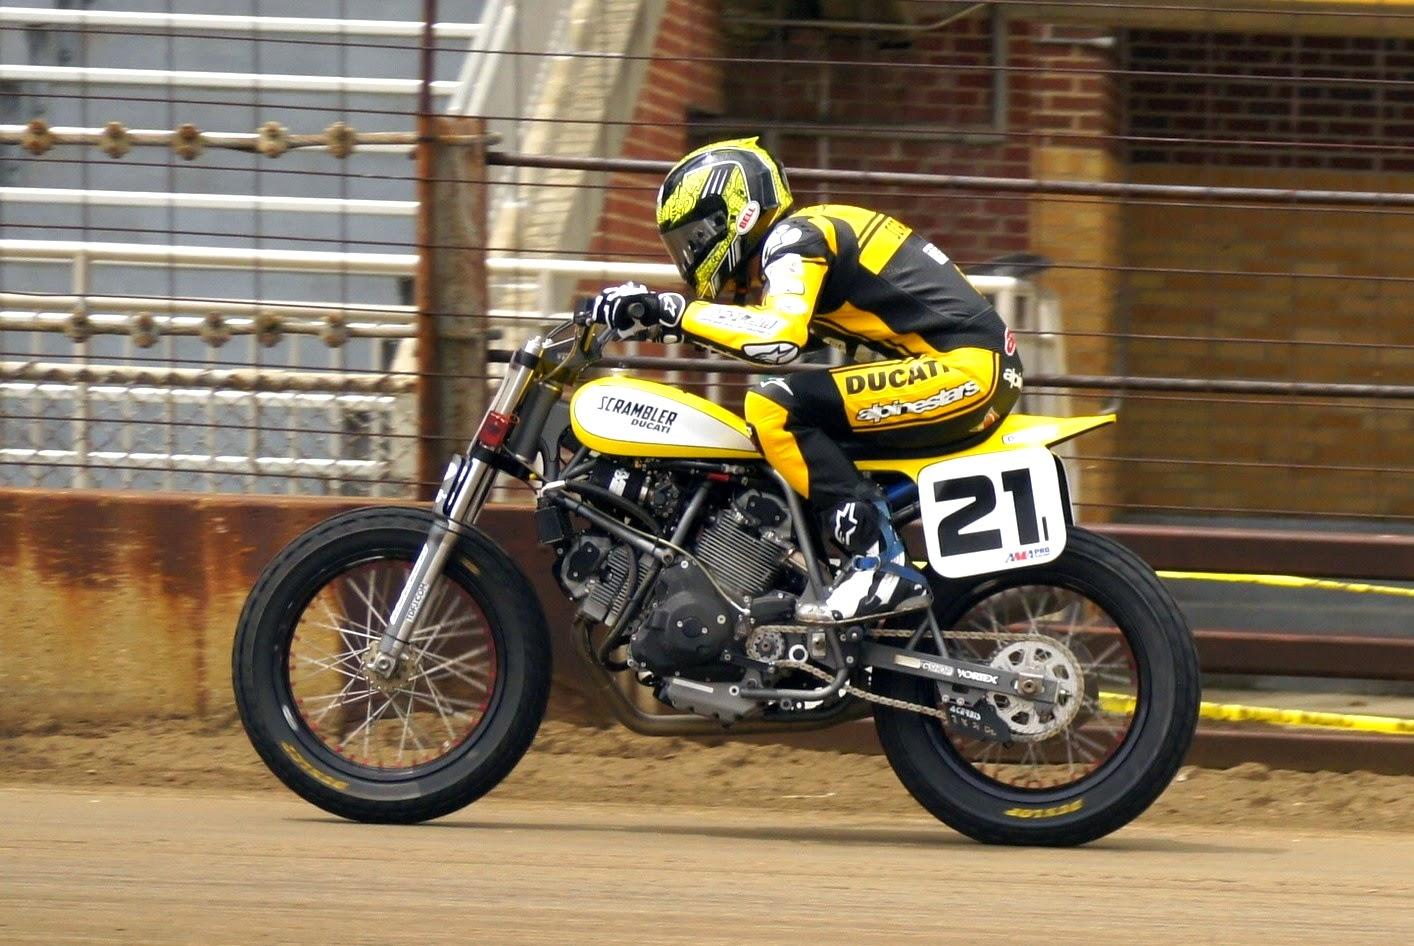 Springfield Motor Sports Kawasaki L